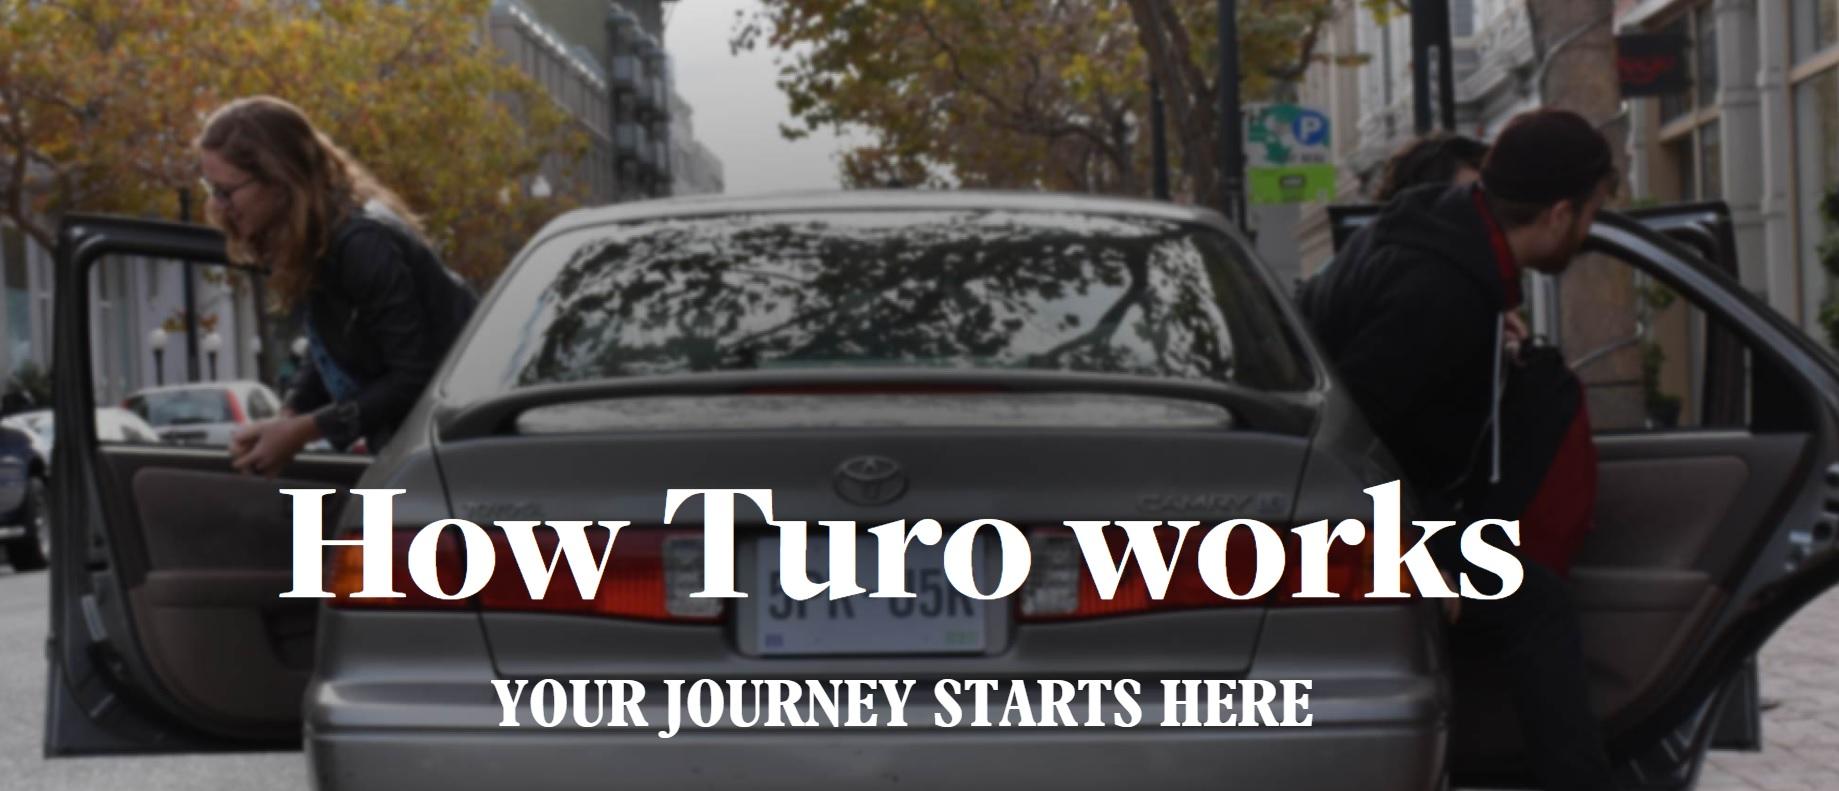 Turo Title